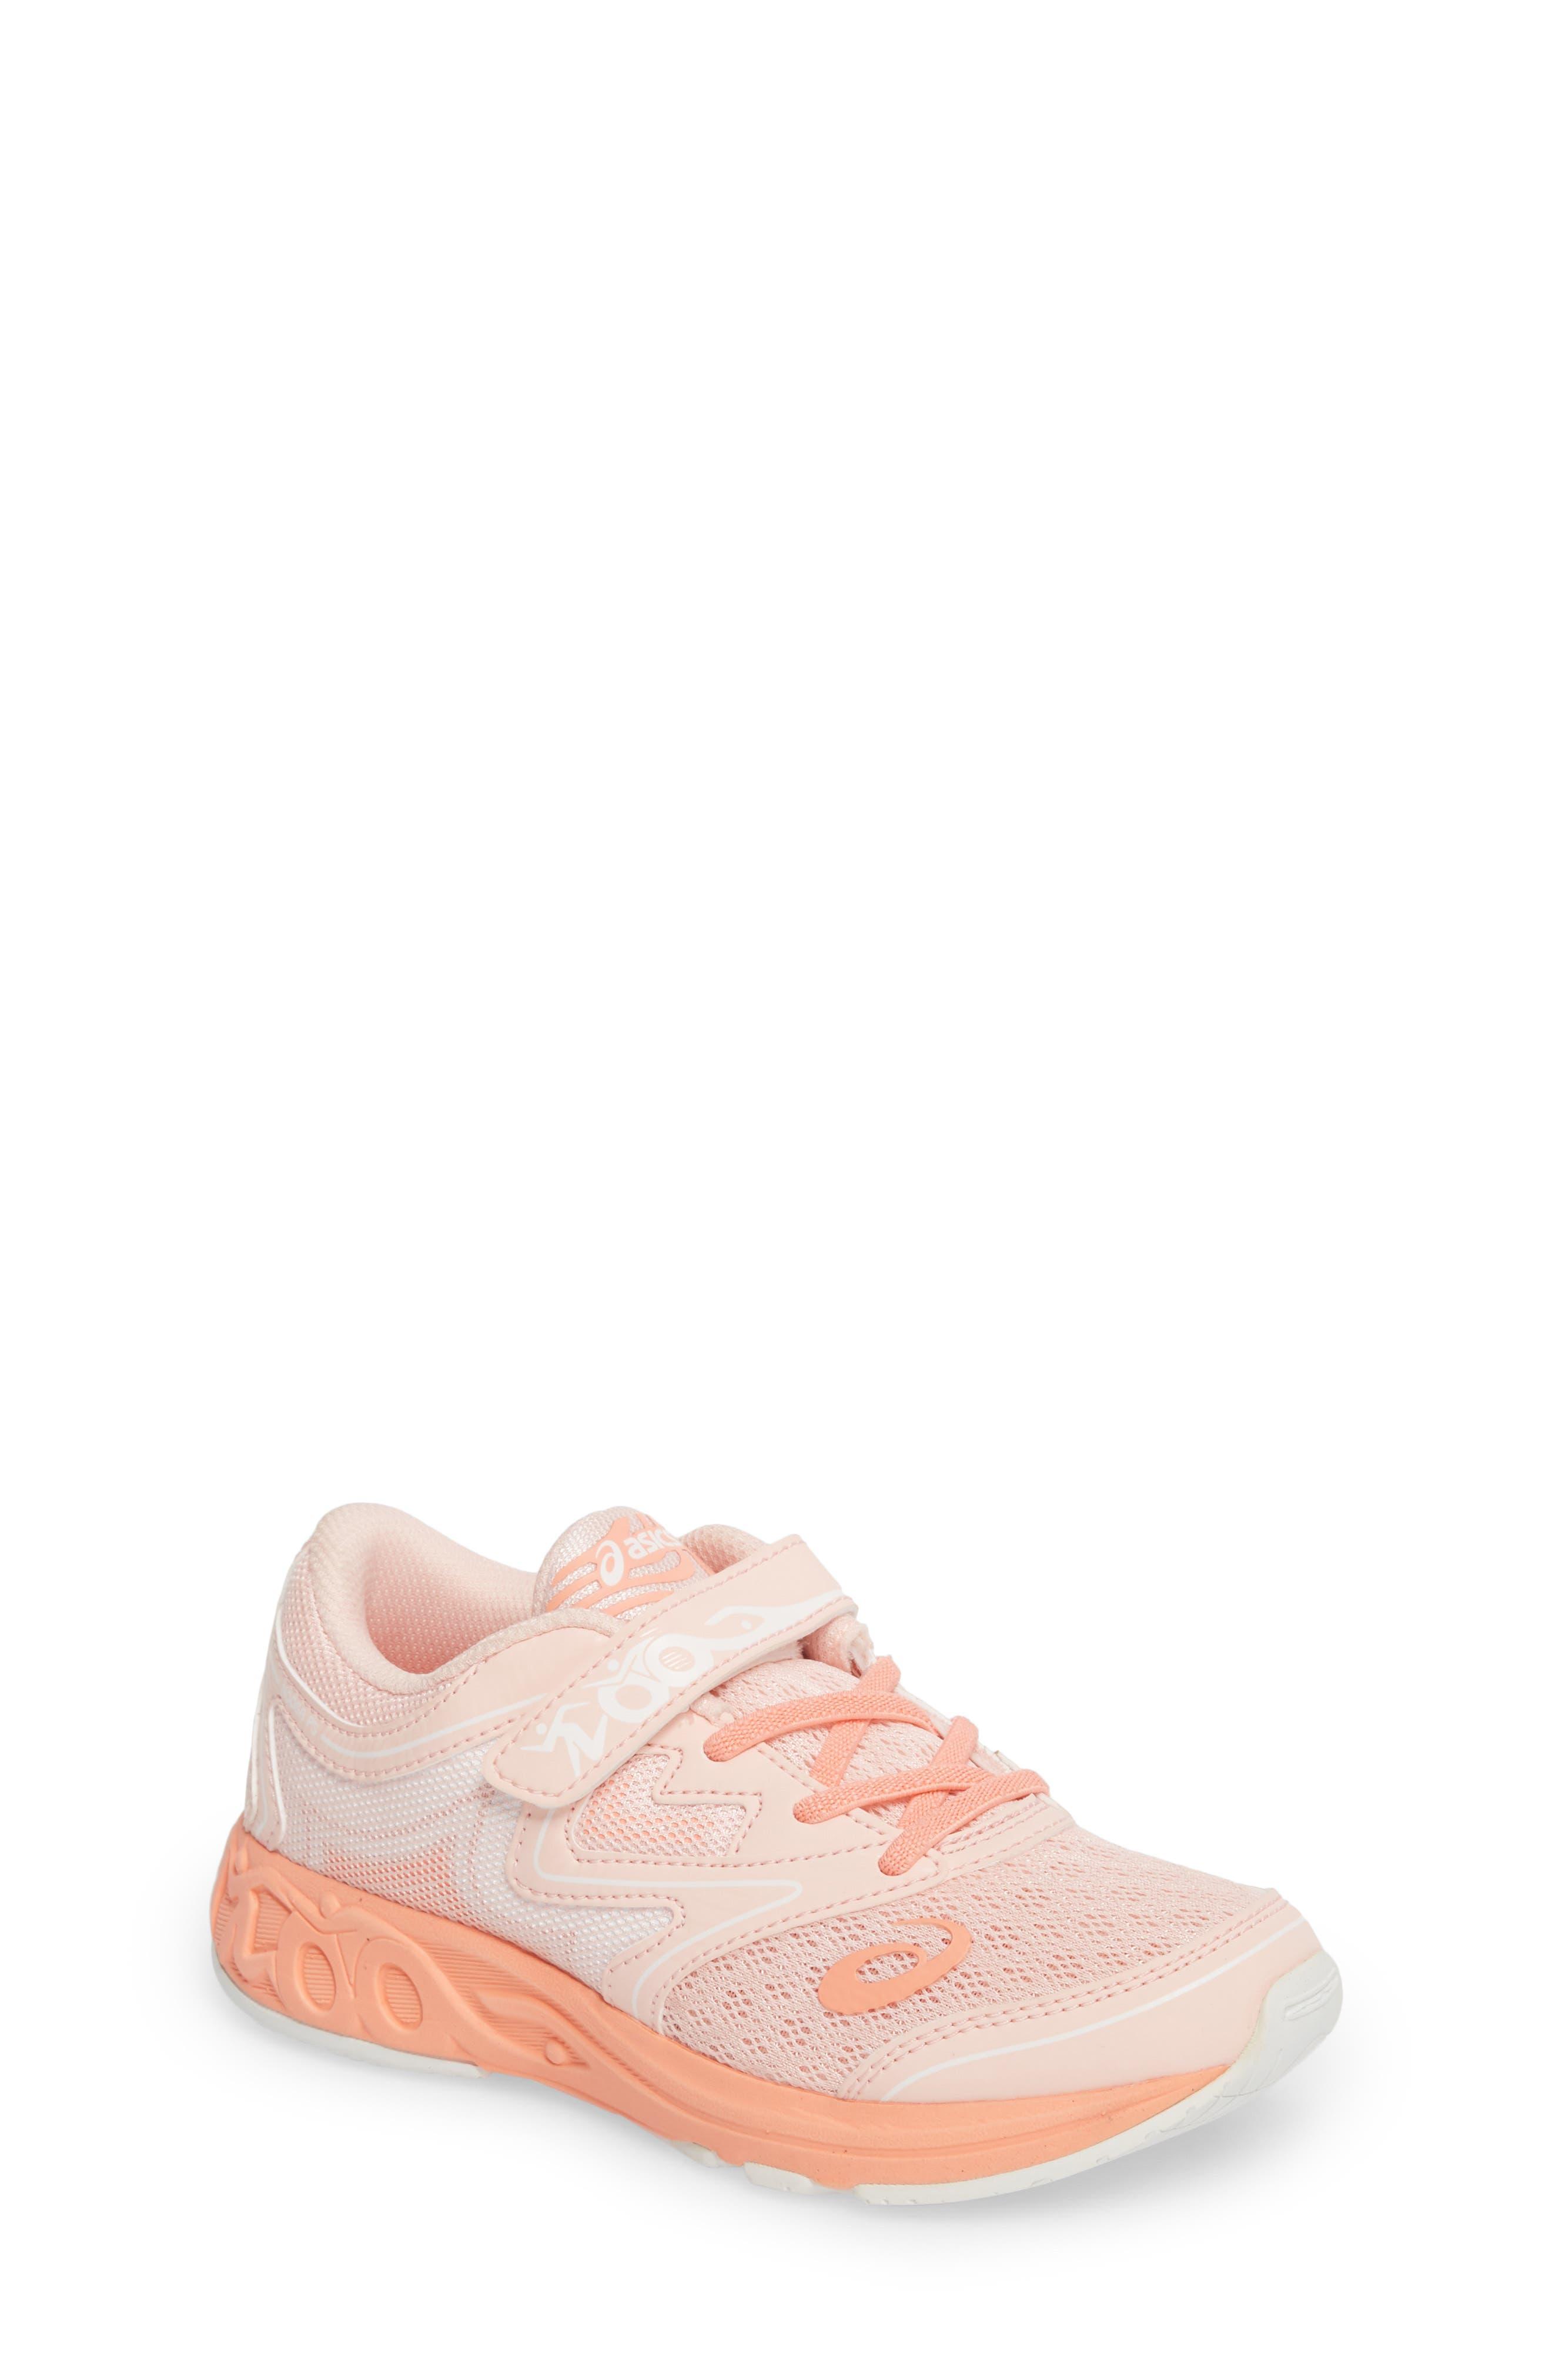 Noosa PS Sneaker,                         Main,                         color, Seashell Pink/ Begonia/ White